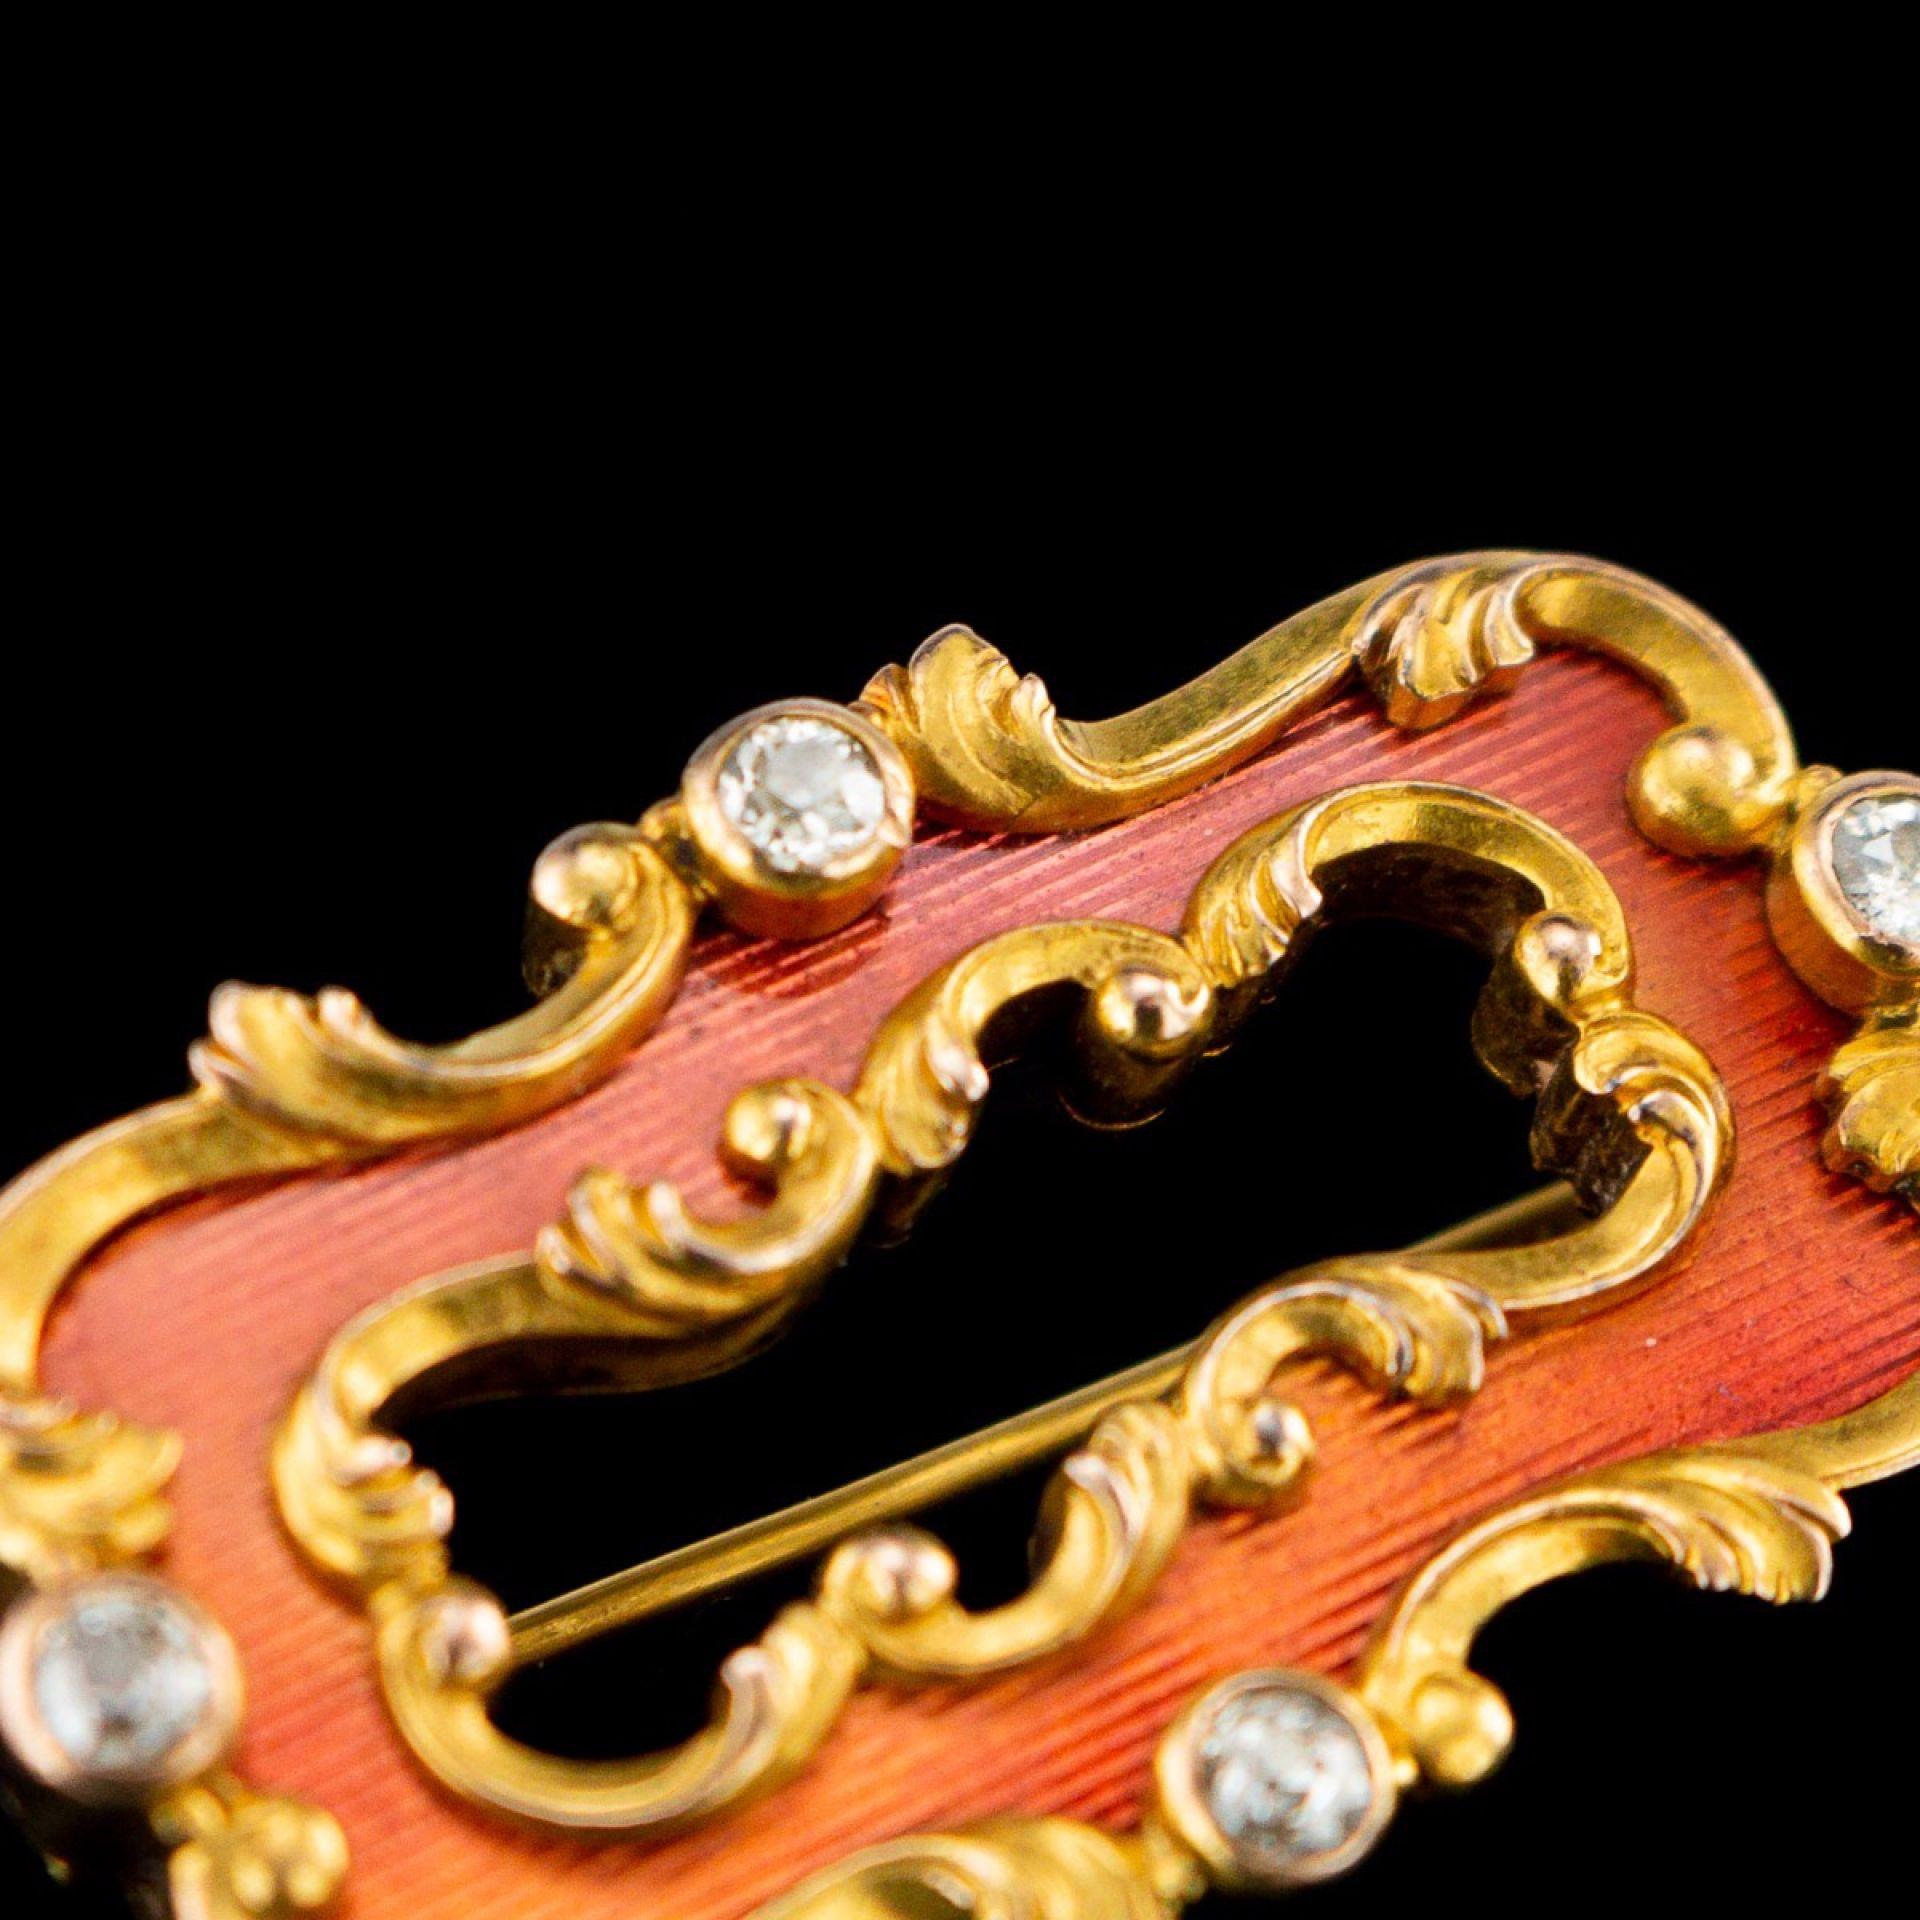 ANTIQUE 19thC RUSSIAN FABERGE 56 GOLD & ENAMEL BROOCH, OSKAR PIHL c.1890